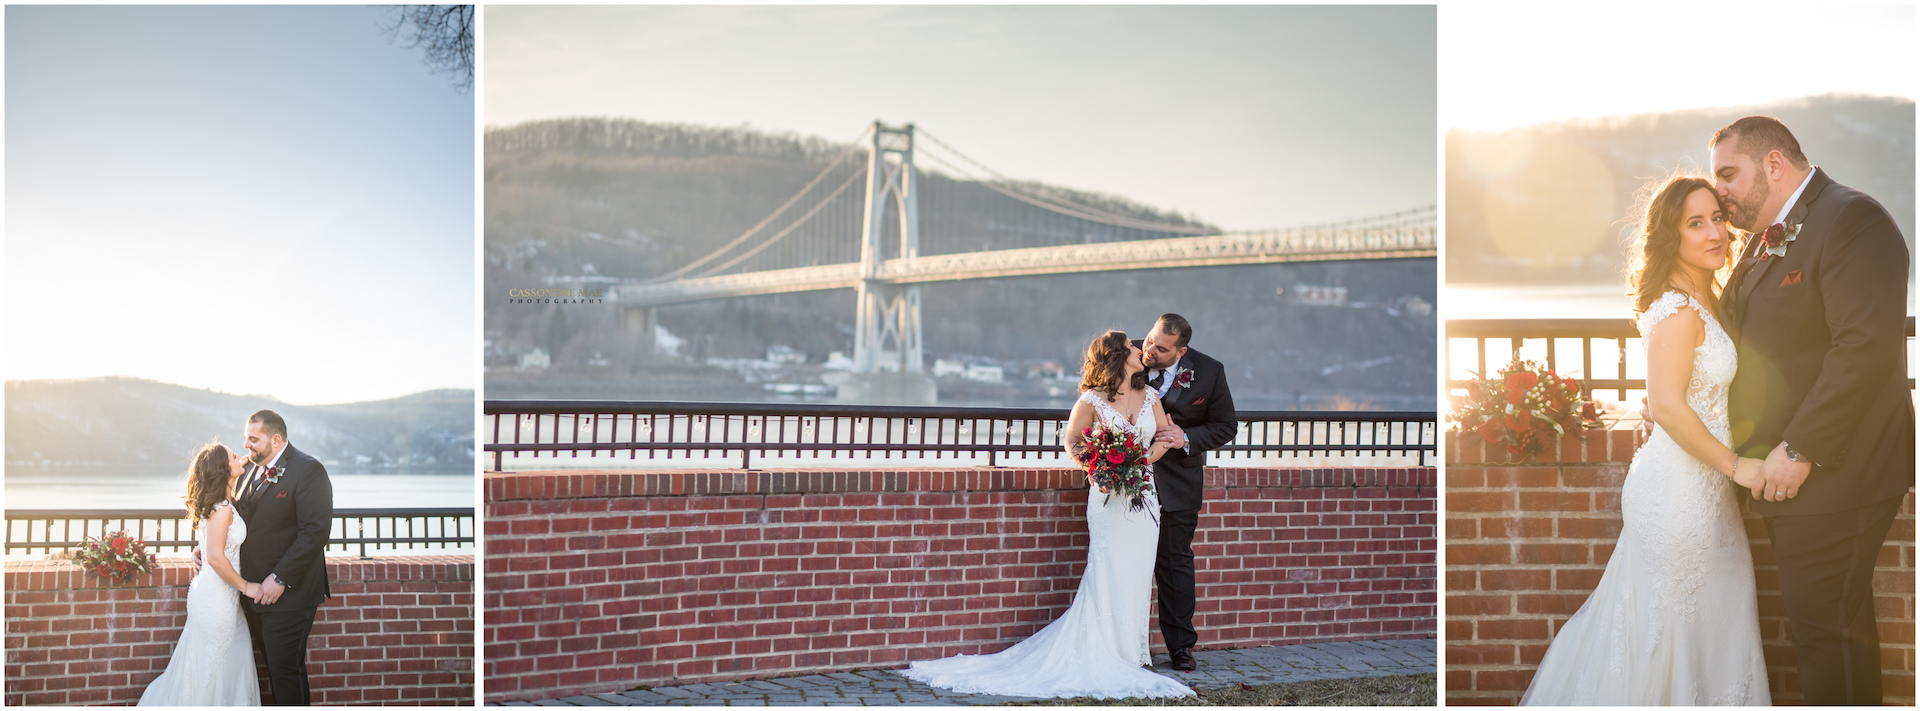 Cassondre Mae Photography The Grandview Weddings 32.jpg